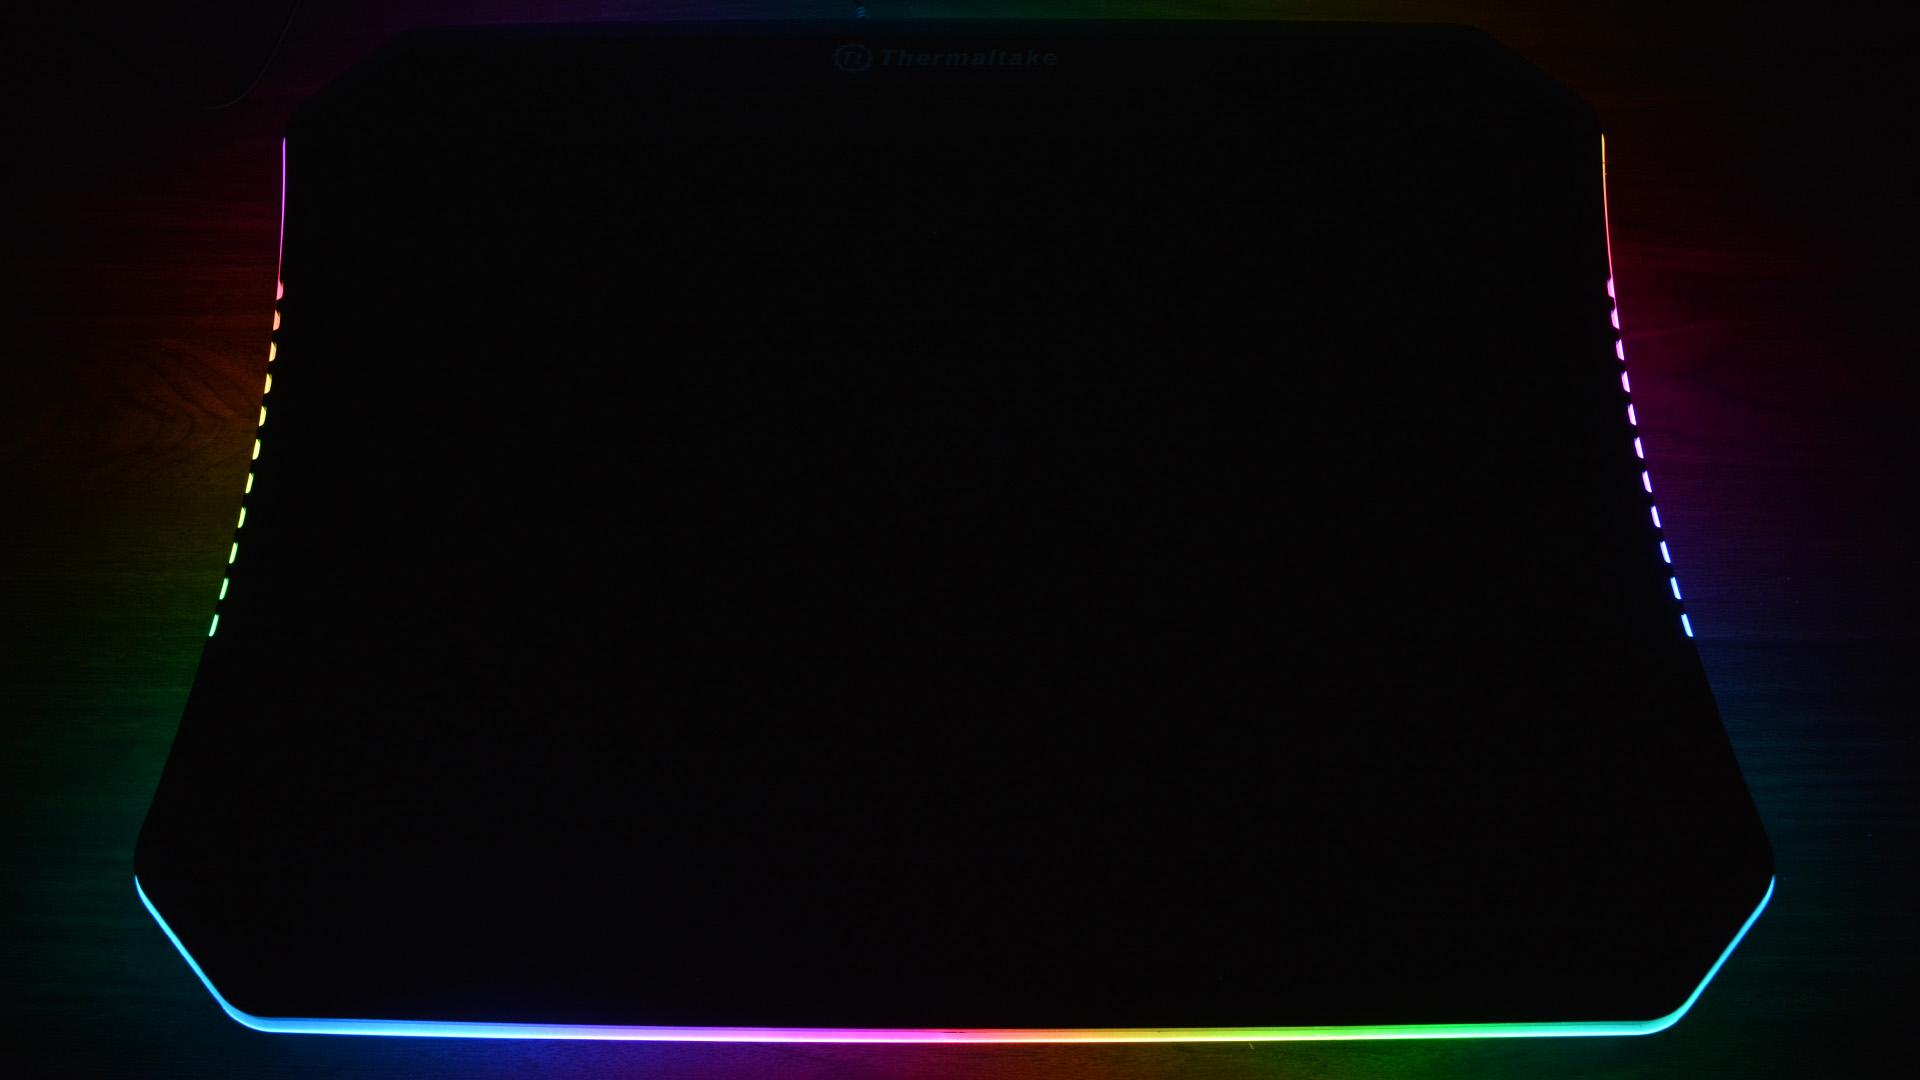 Thermaltake Massive 20 RGB lights